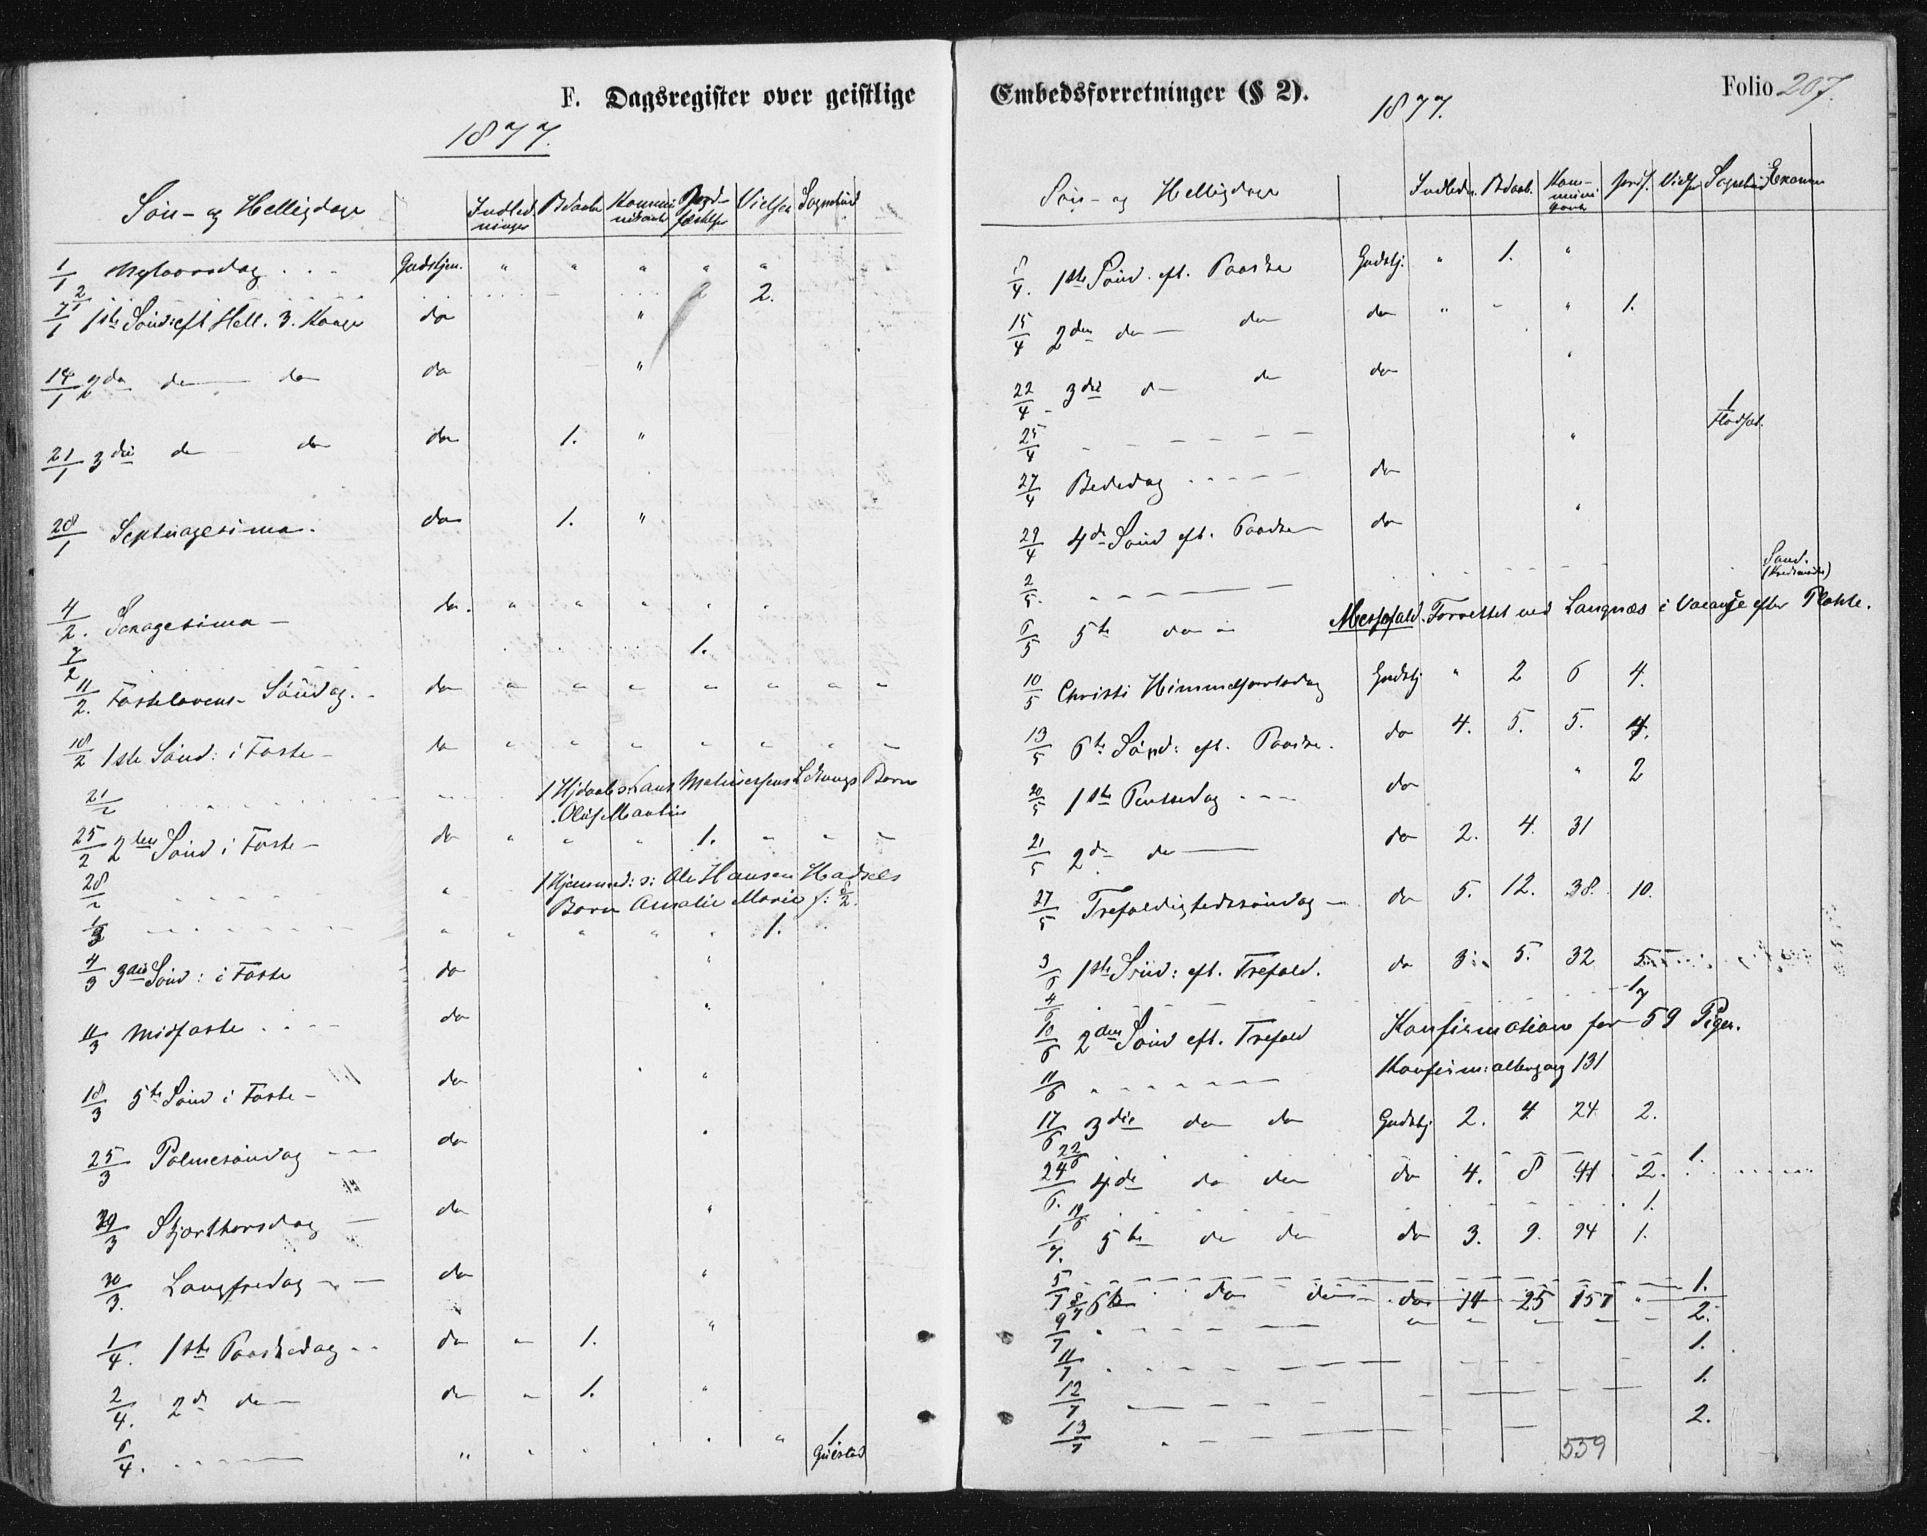 SAT, Ministerialprotokoller, klokkerbøker og fødselsregistre - Nordland, 888/L1243: Ministerialbok nr. 888A09, 1876-1879, s. 207